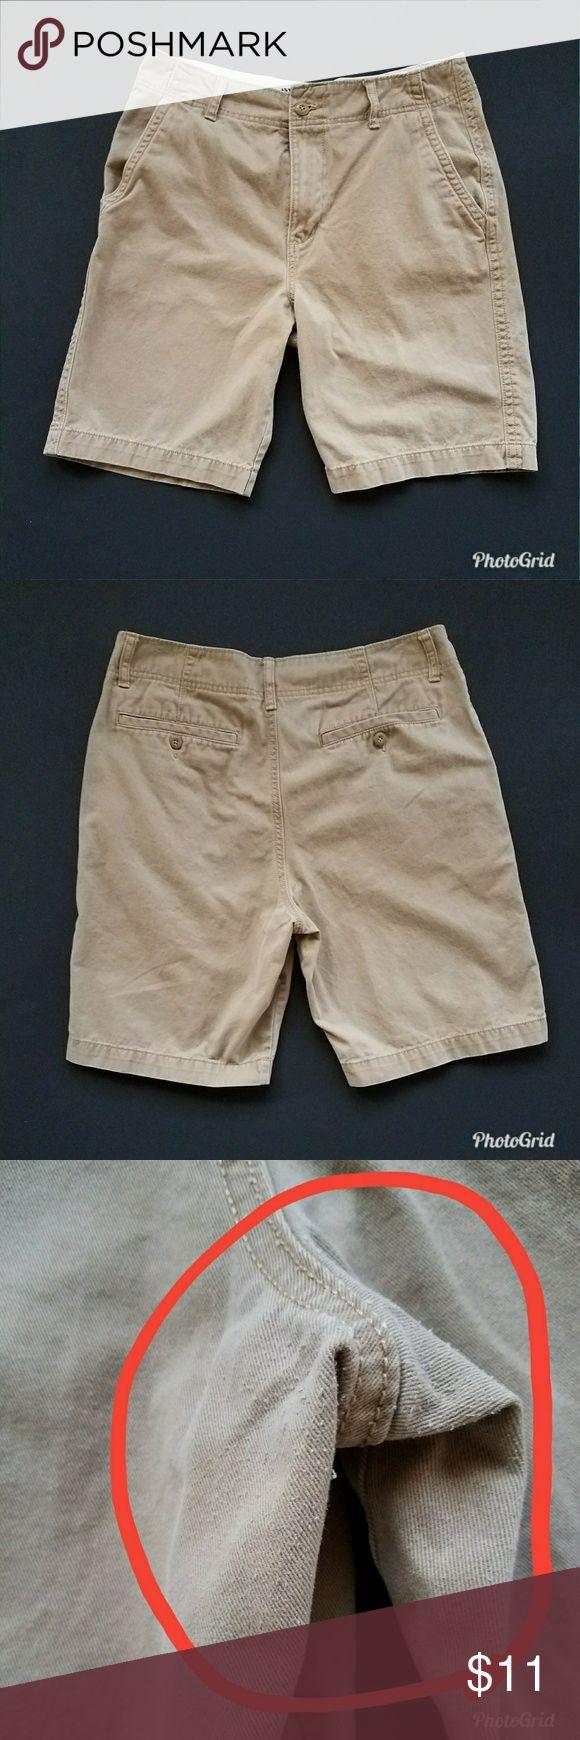 Men's Khaki Shorts Old Navy Khaki Shorts. Has some wear to them. Old Navy Shorts